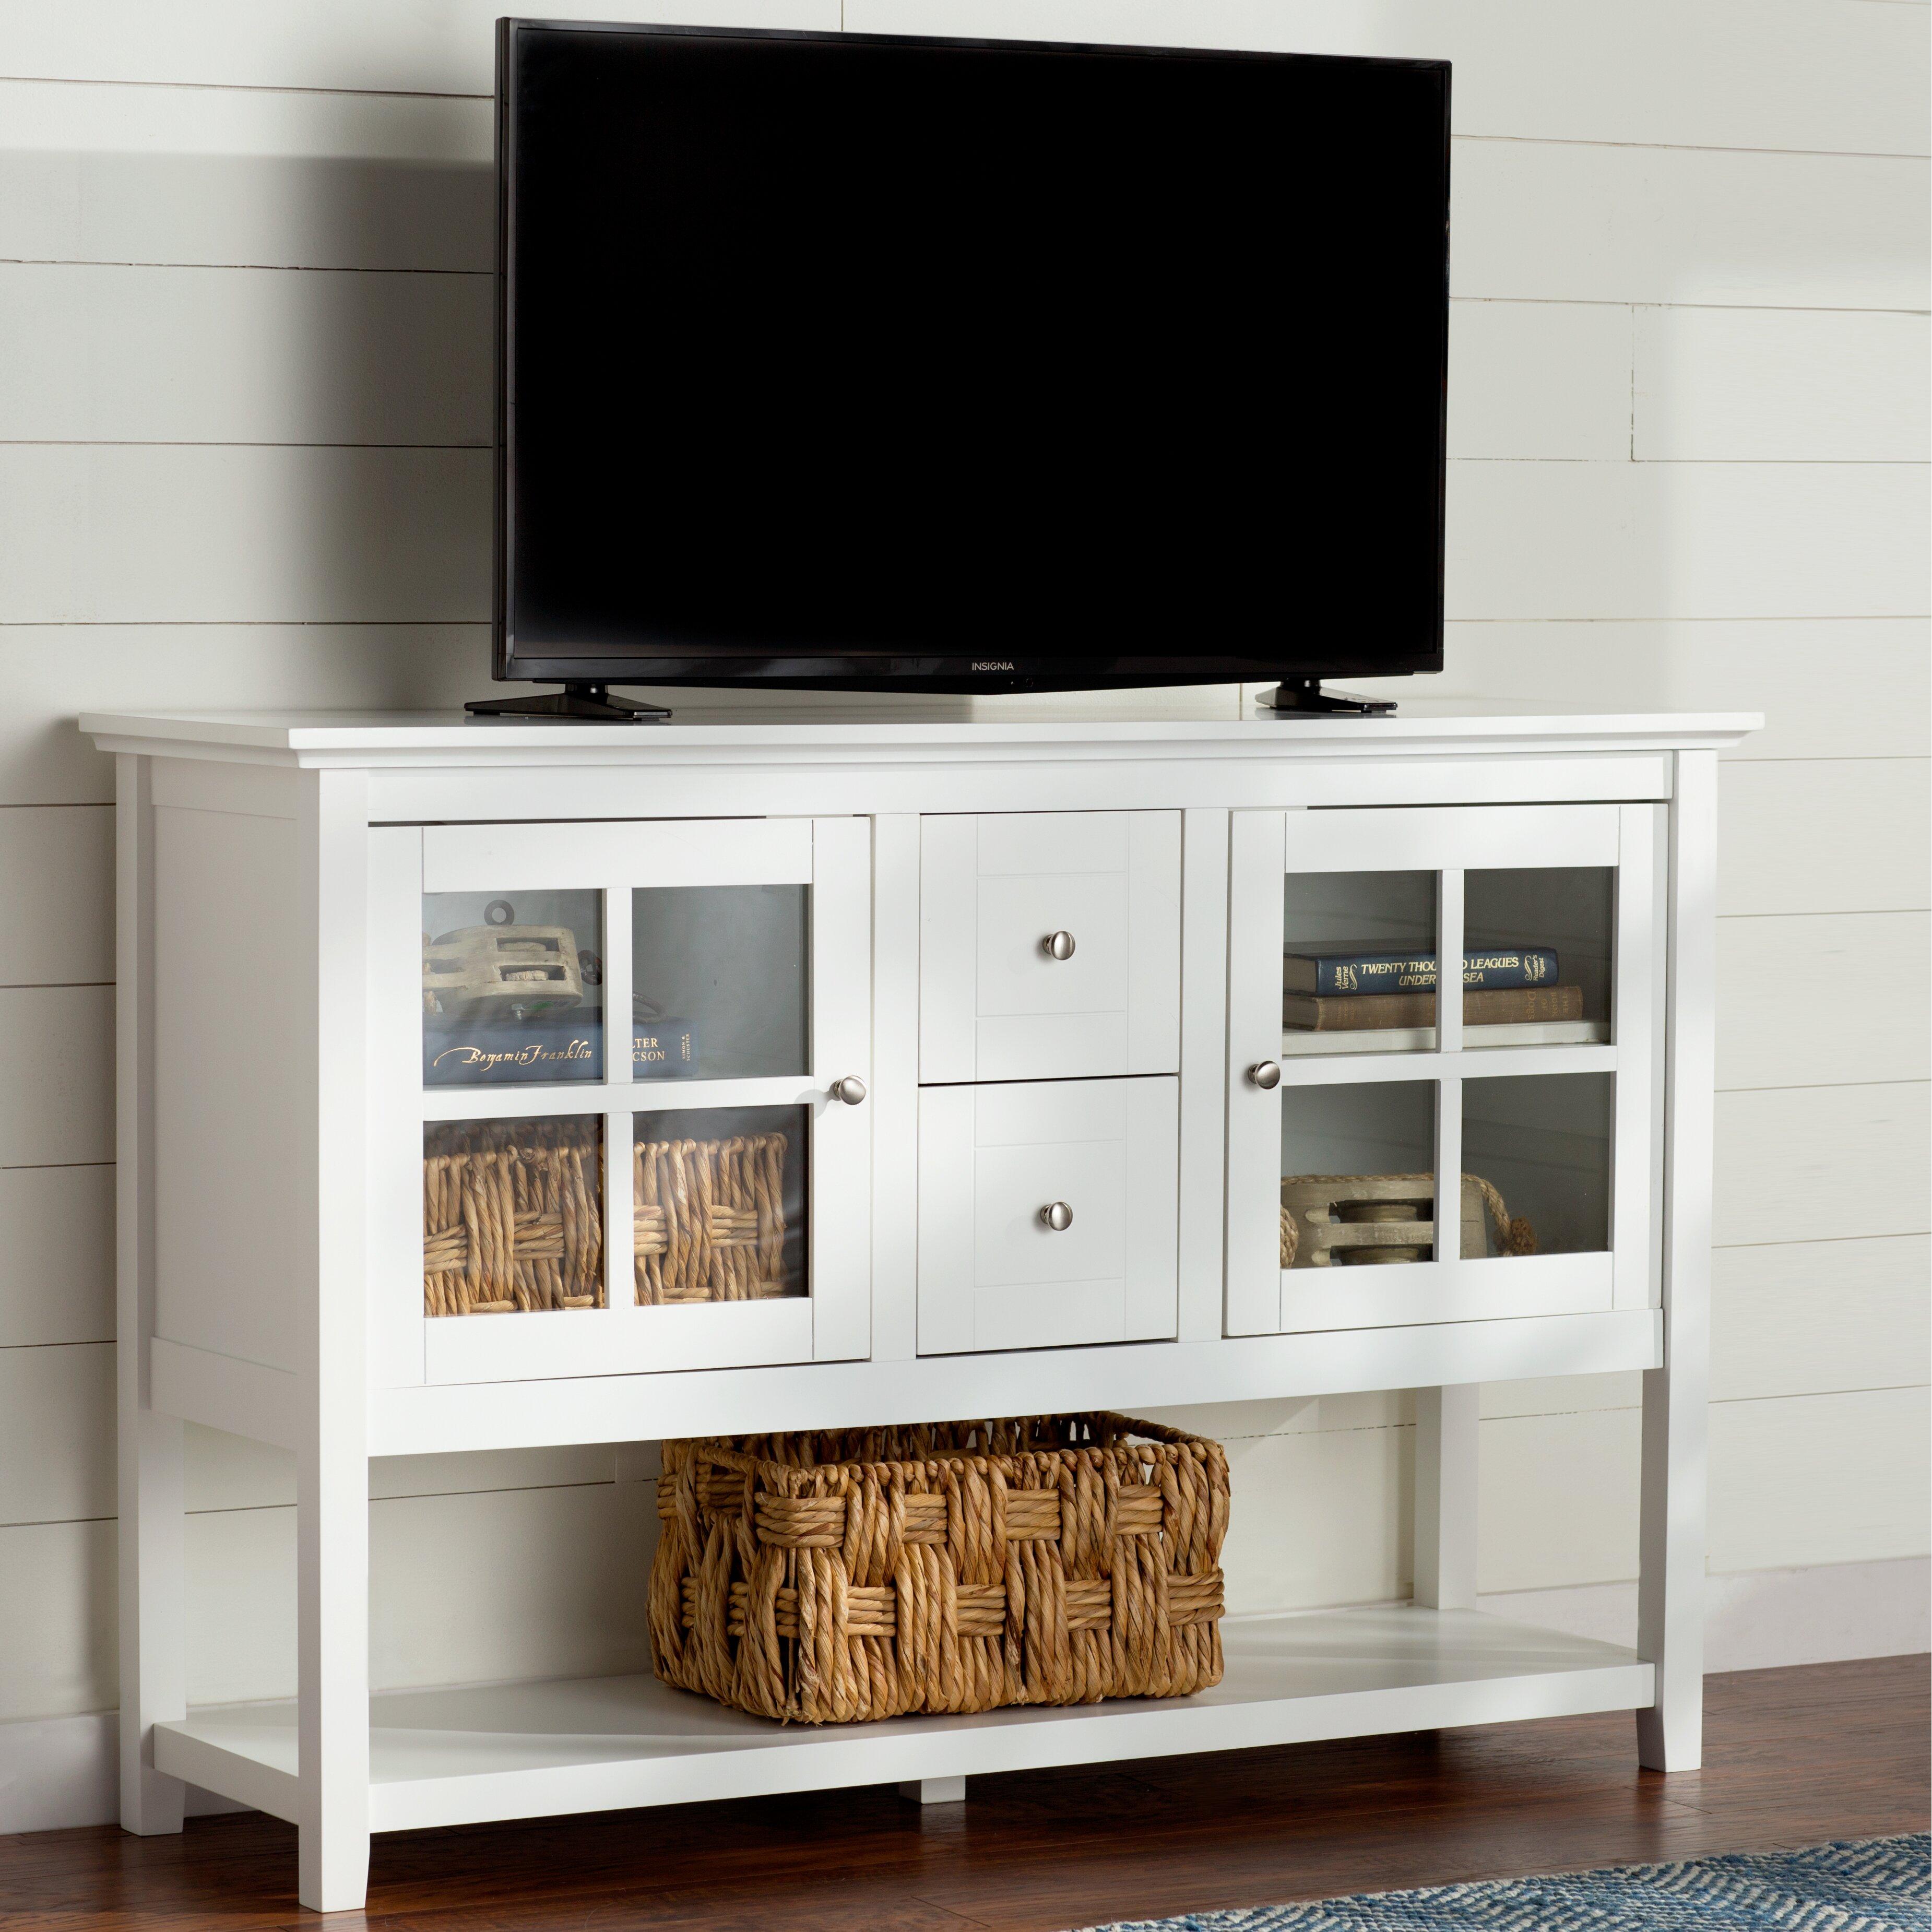 Antique white tv stand